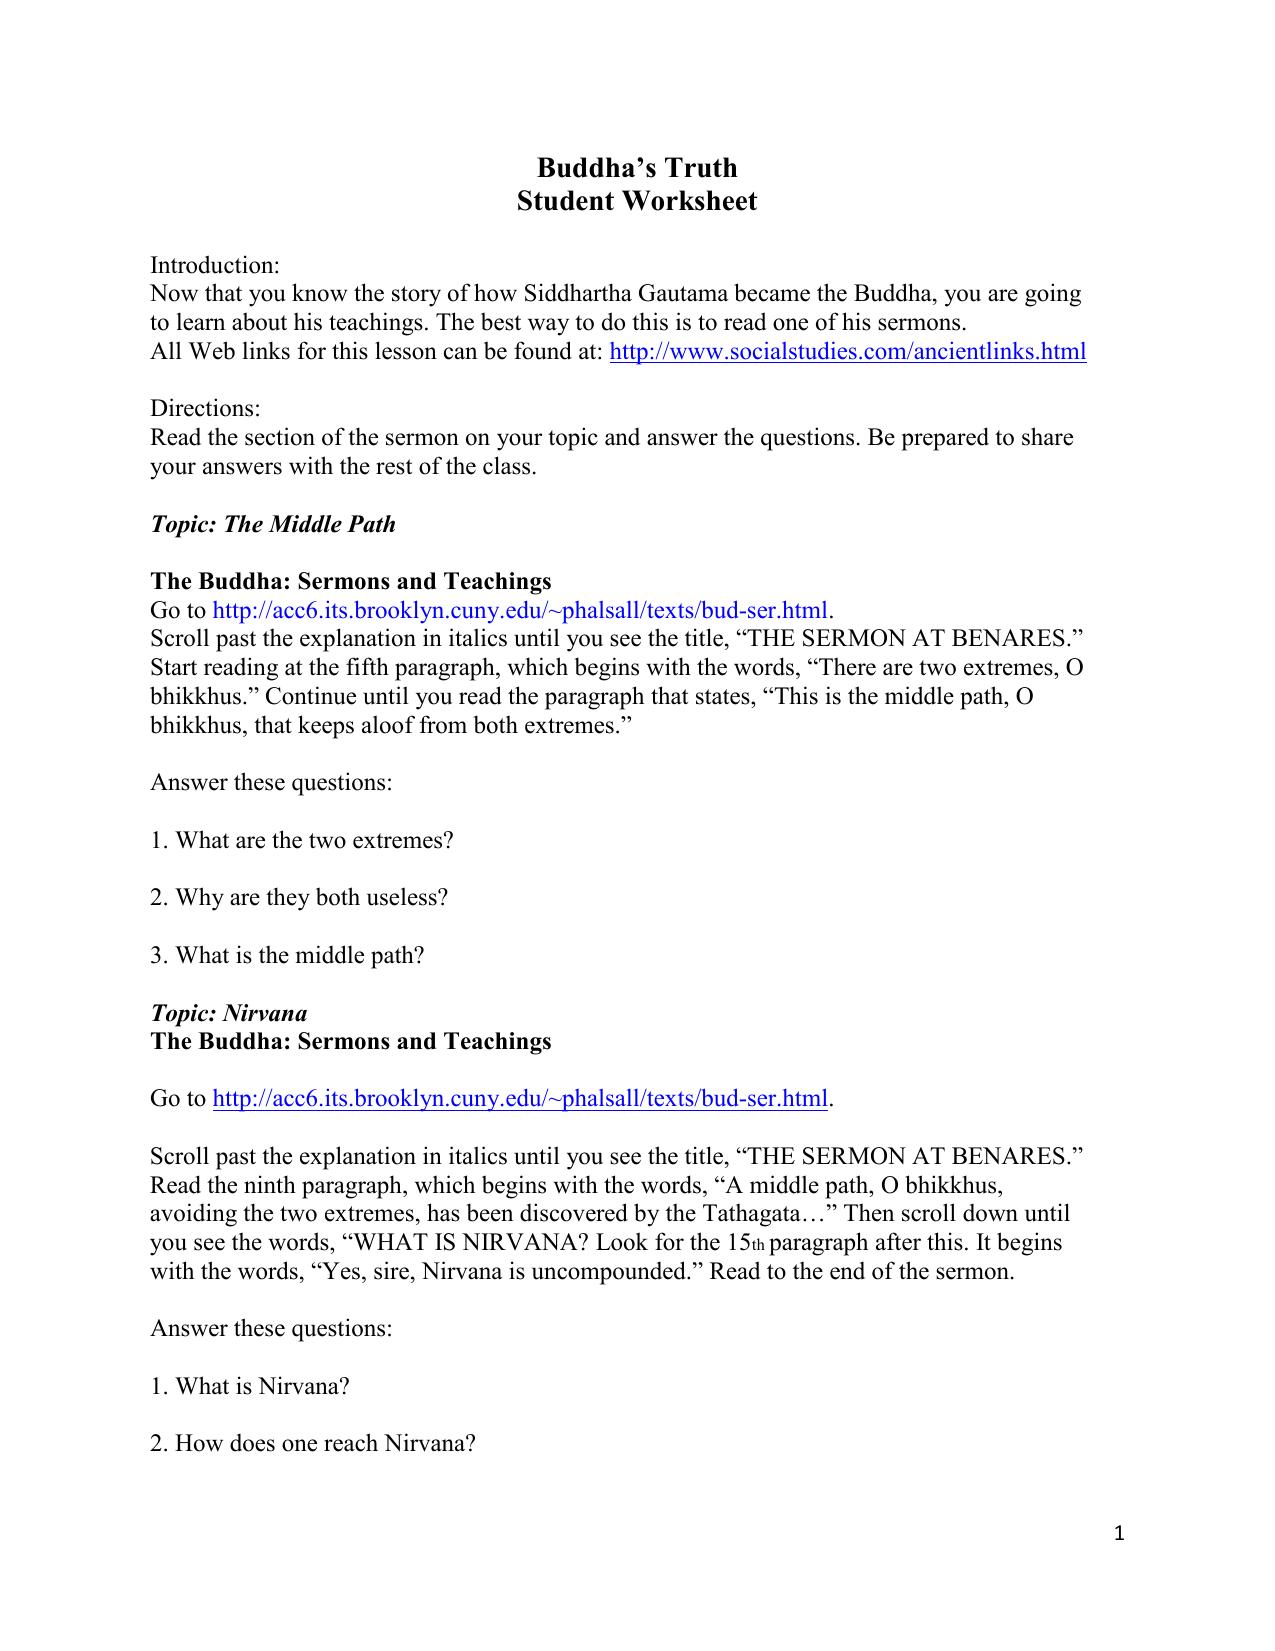 worksheet Tener Worksheet ser worksheet 1 answers the best and most comprehensive worksheets buddhas truth student worksheet